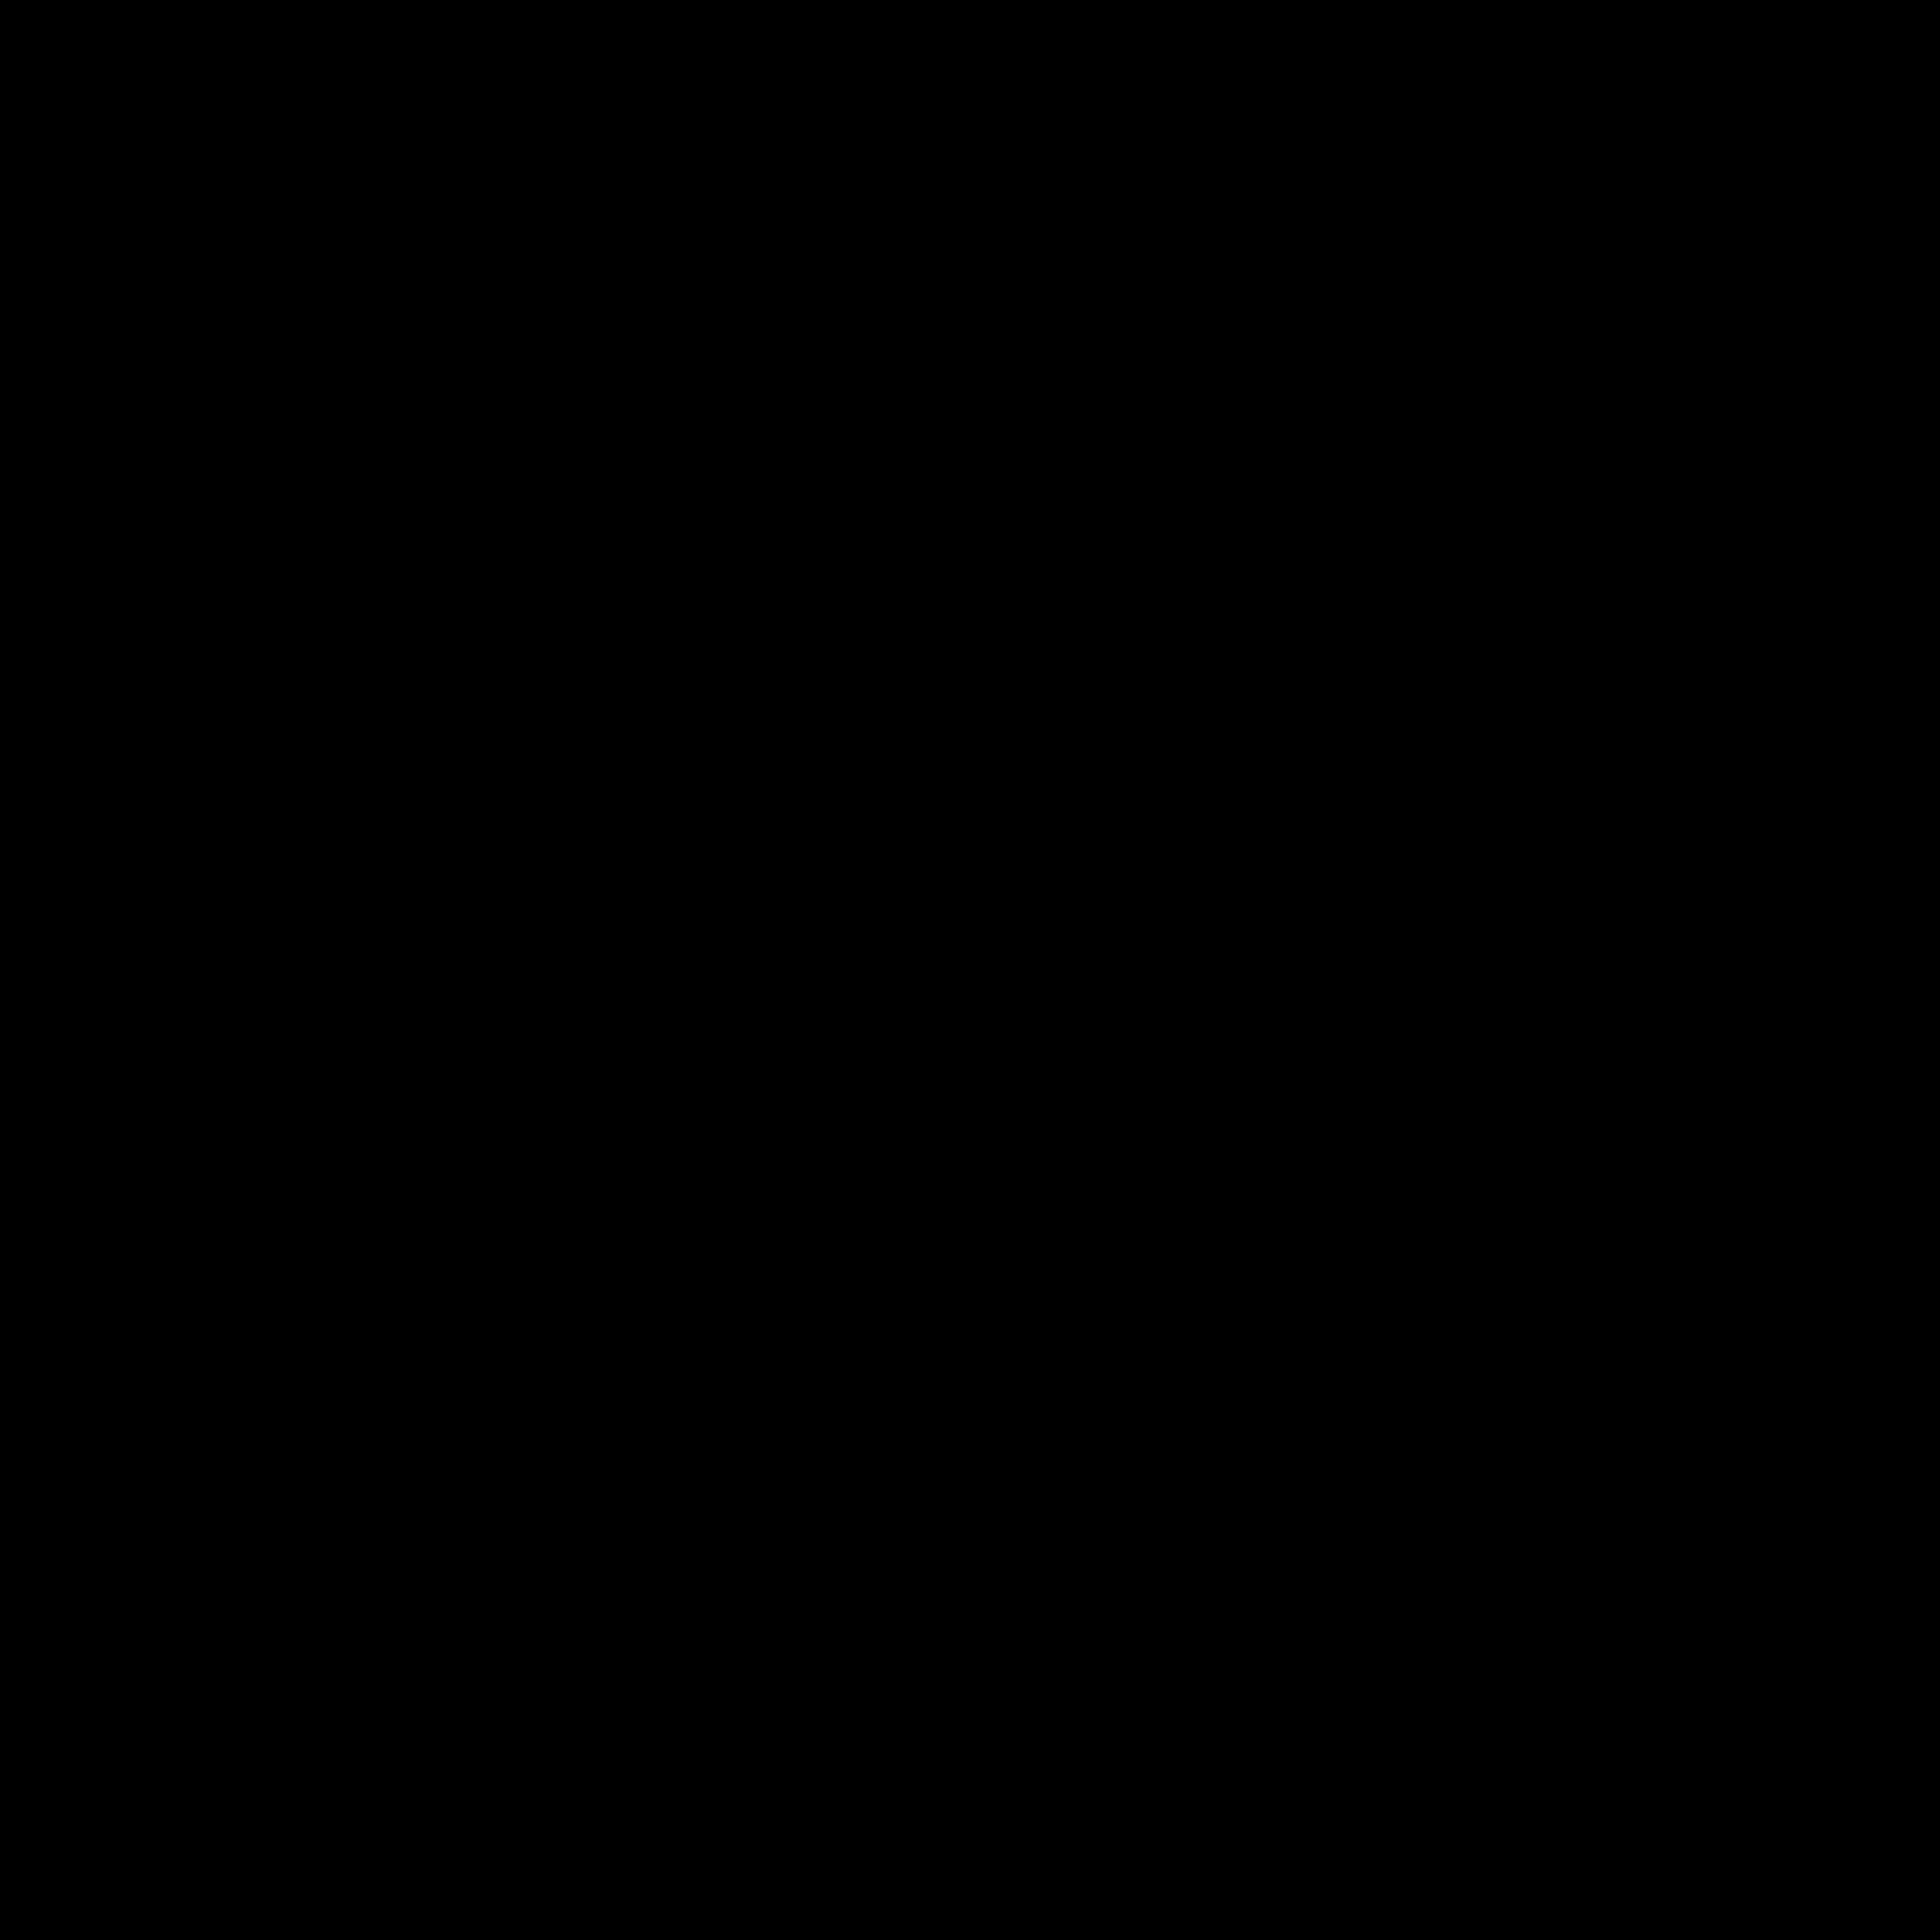 sheraton-hotels-resorts-2-logo-png-transparent (1).png